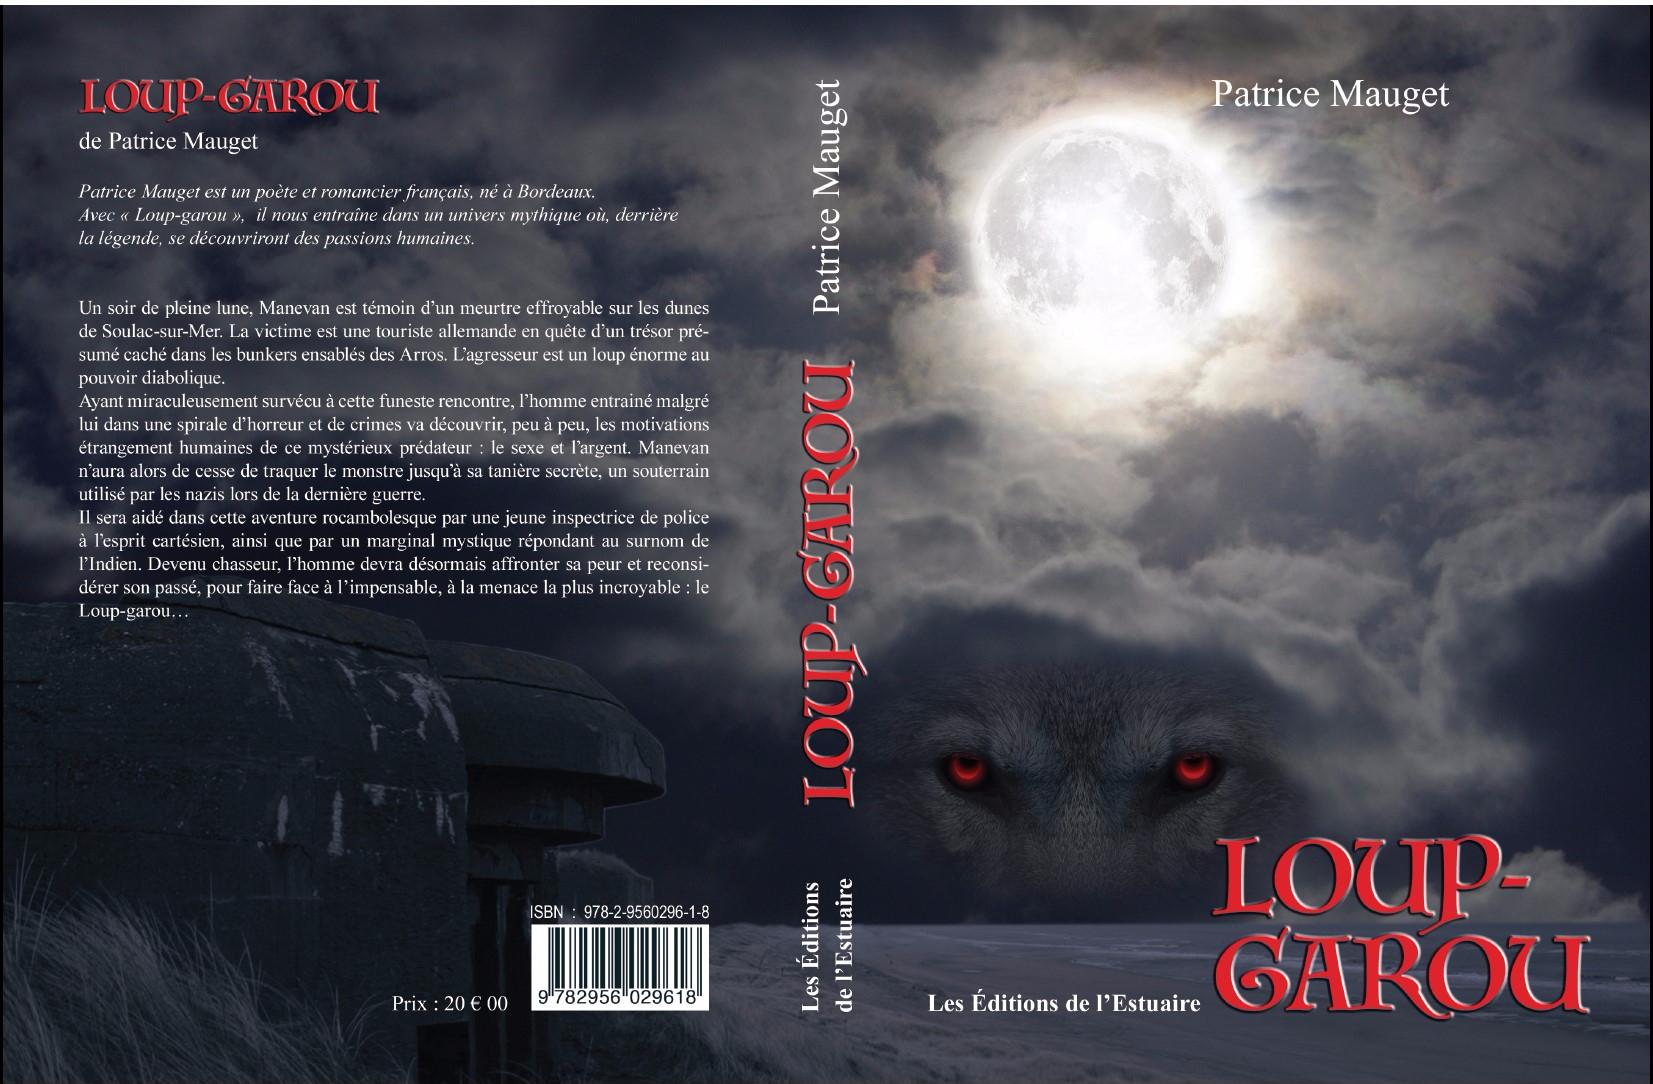 Couverture Loup-garou2